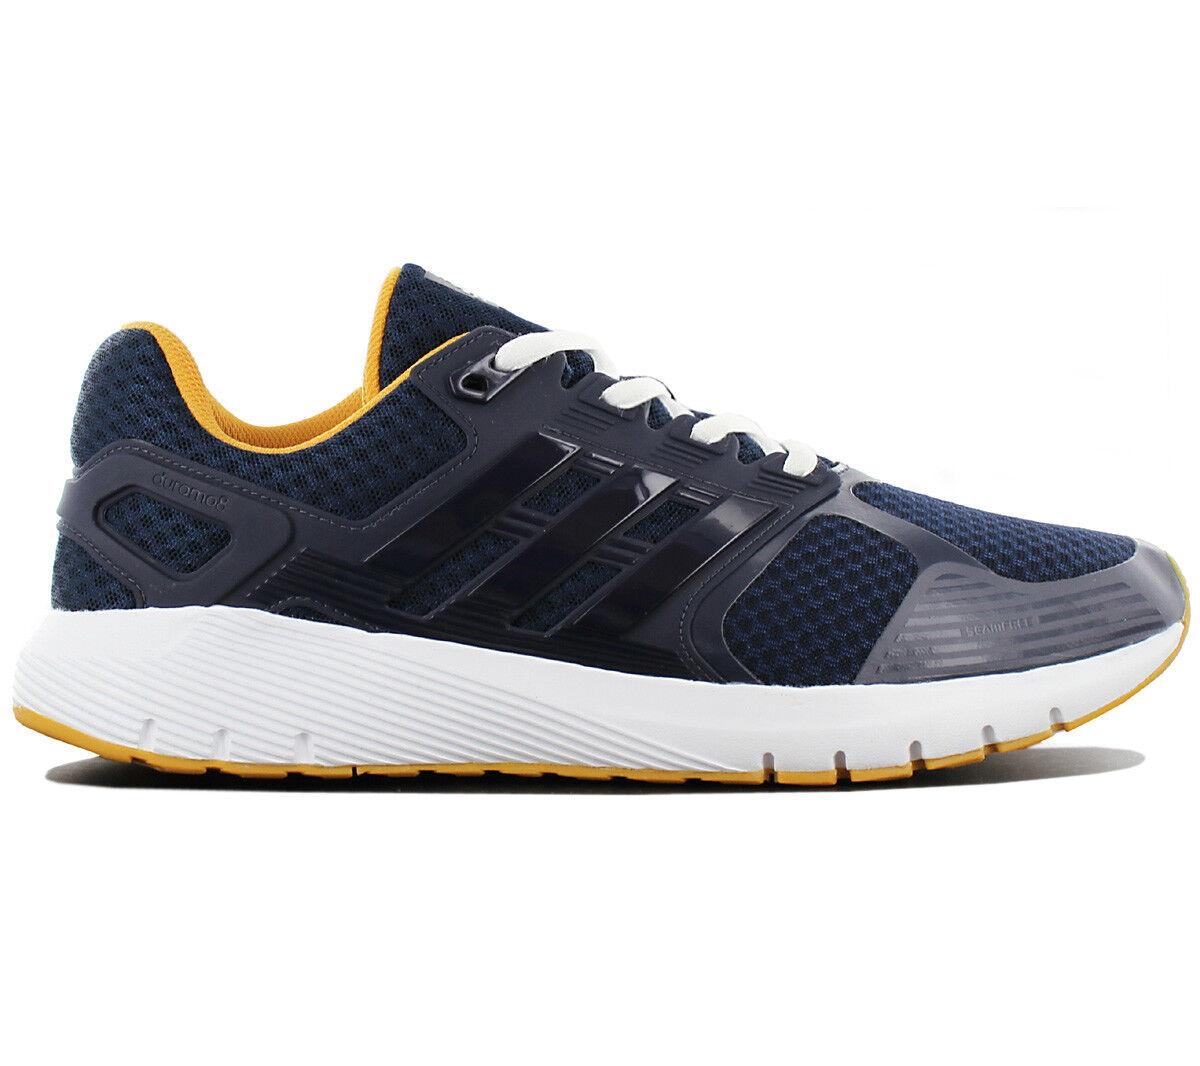 Adidas Duramo 8 M Herren Running Fitness Schuhe Laufschuhe Sportschuhe BA8083